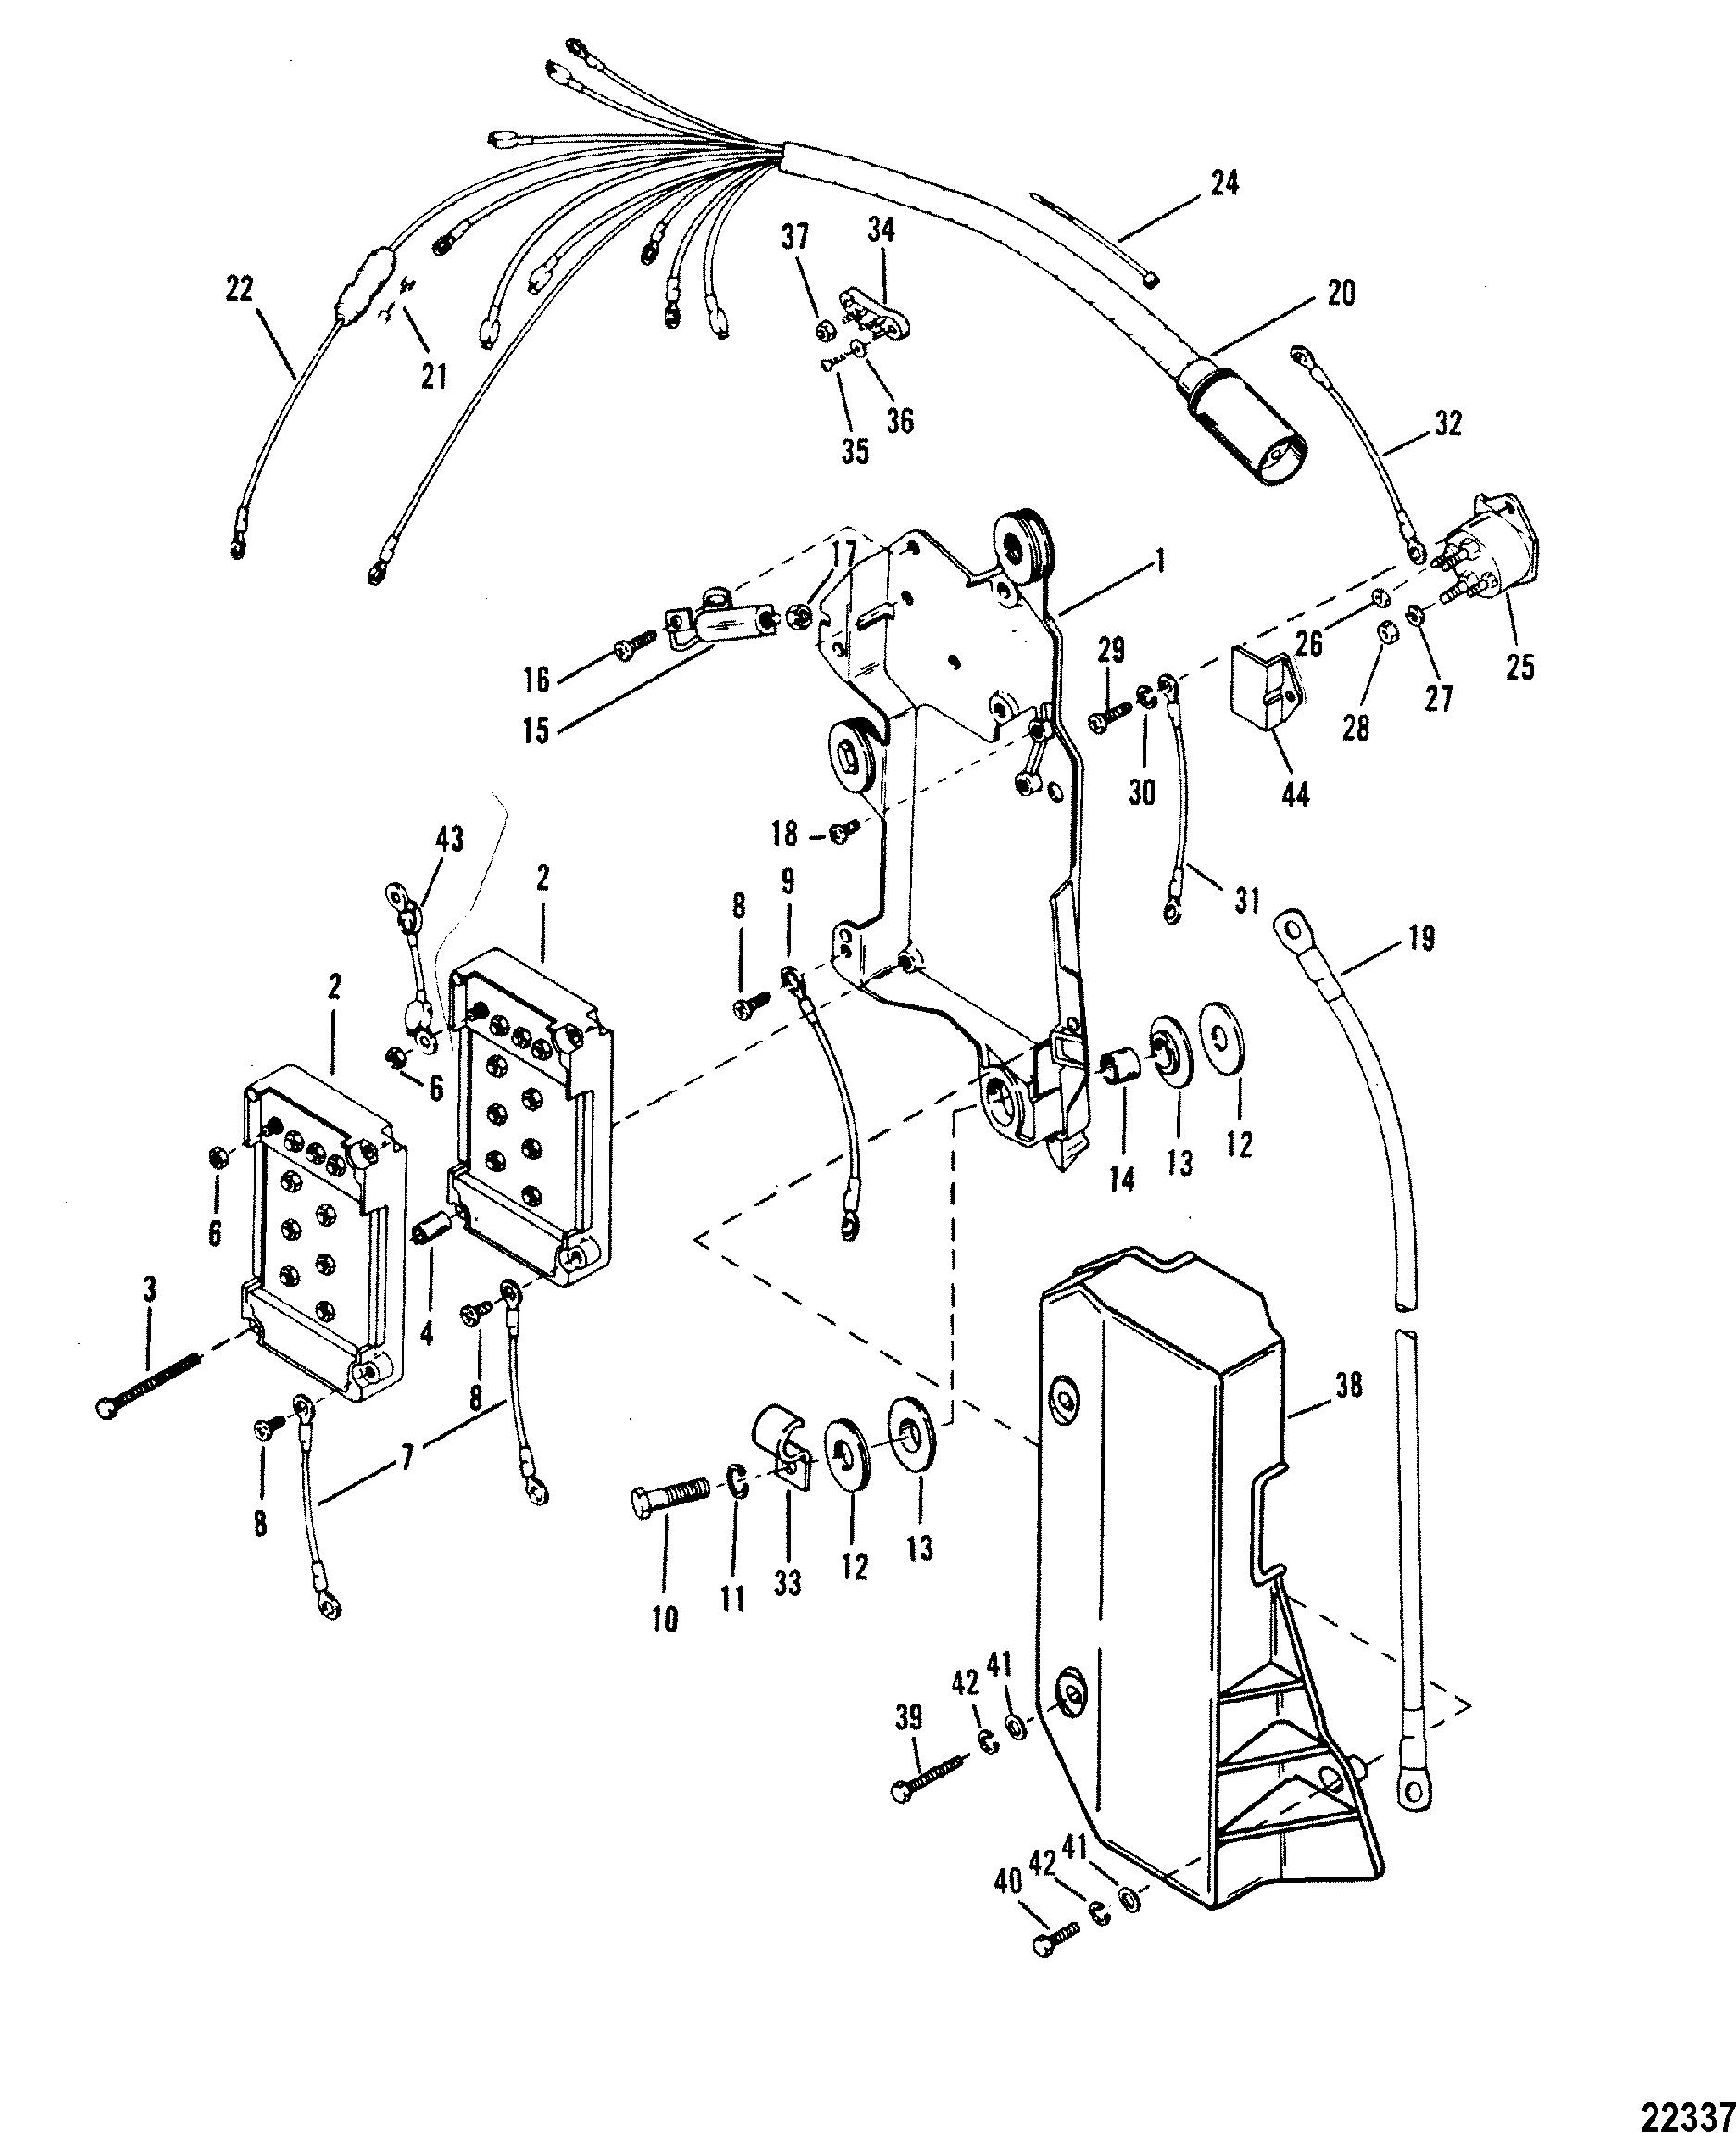 mercury optimax wiring diagram playstation 1 controller wire, Wiring diagram